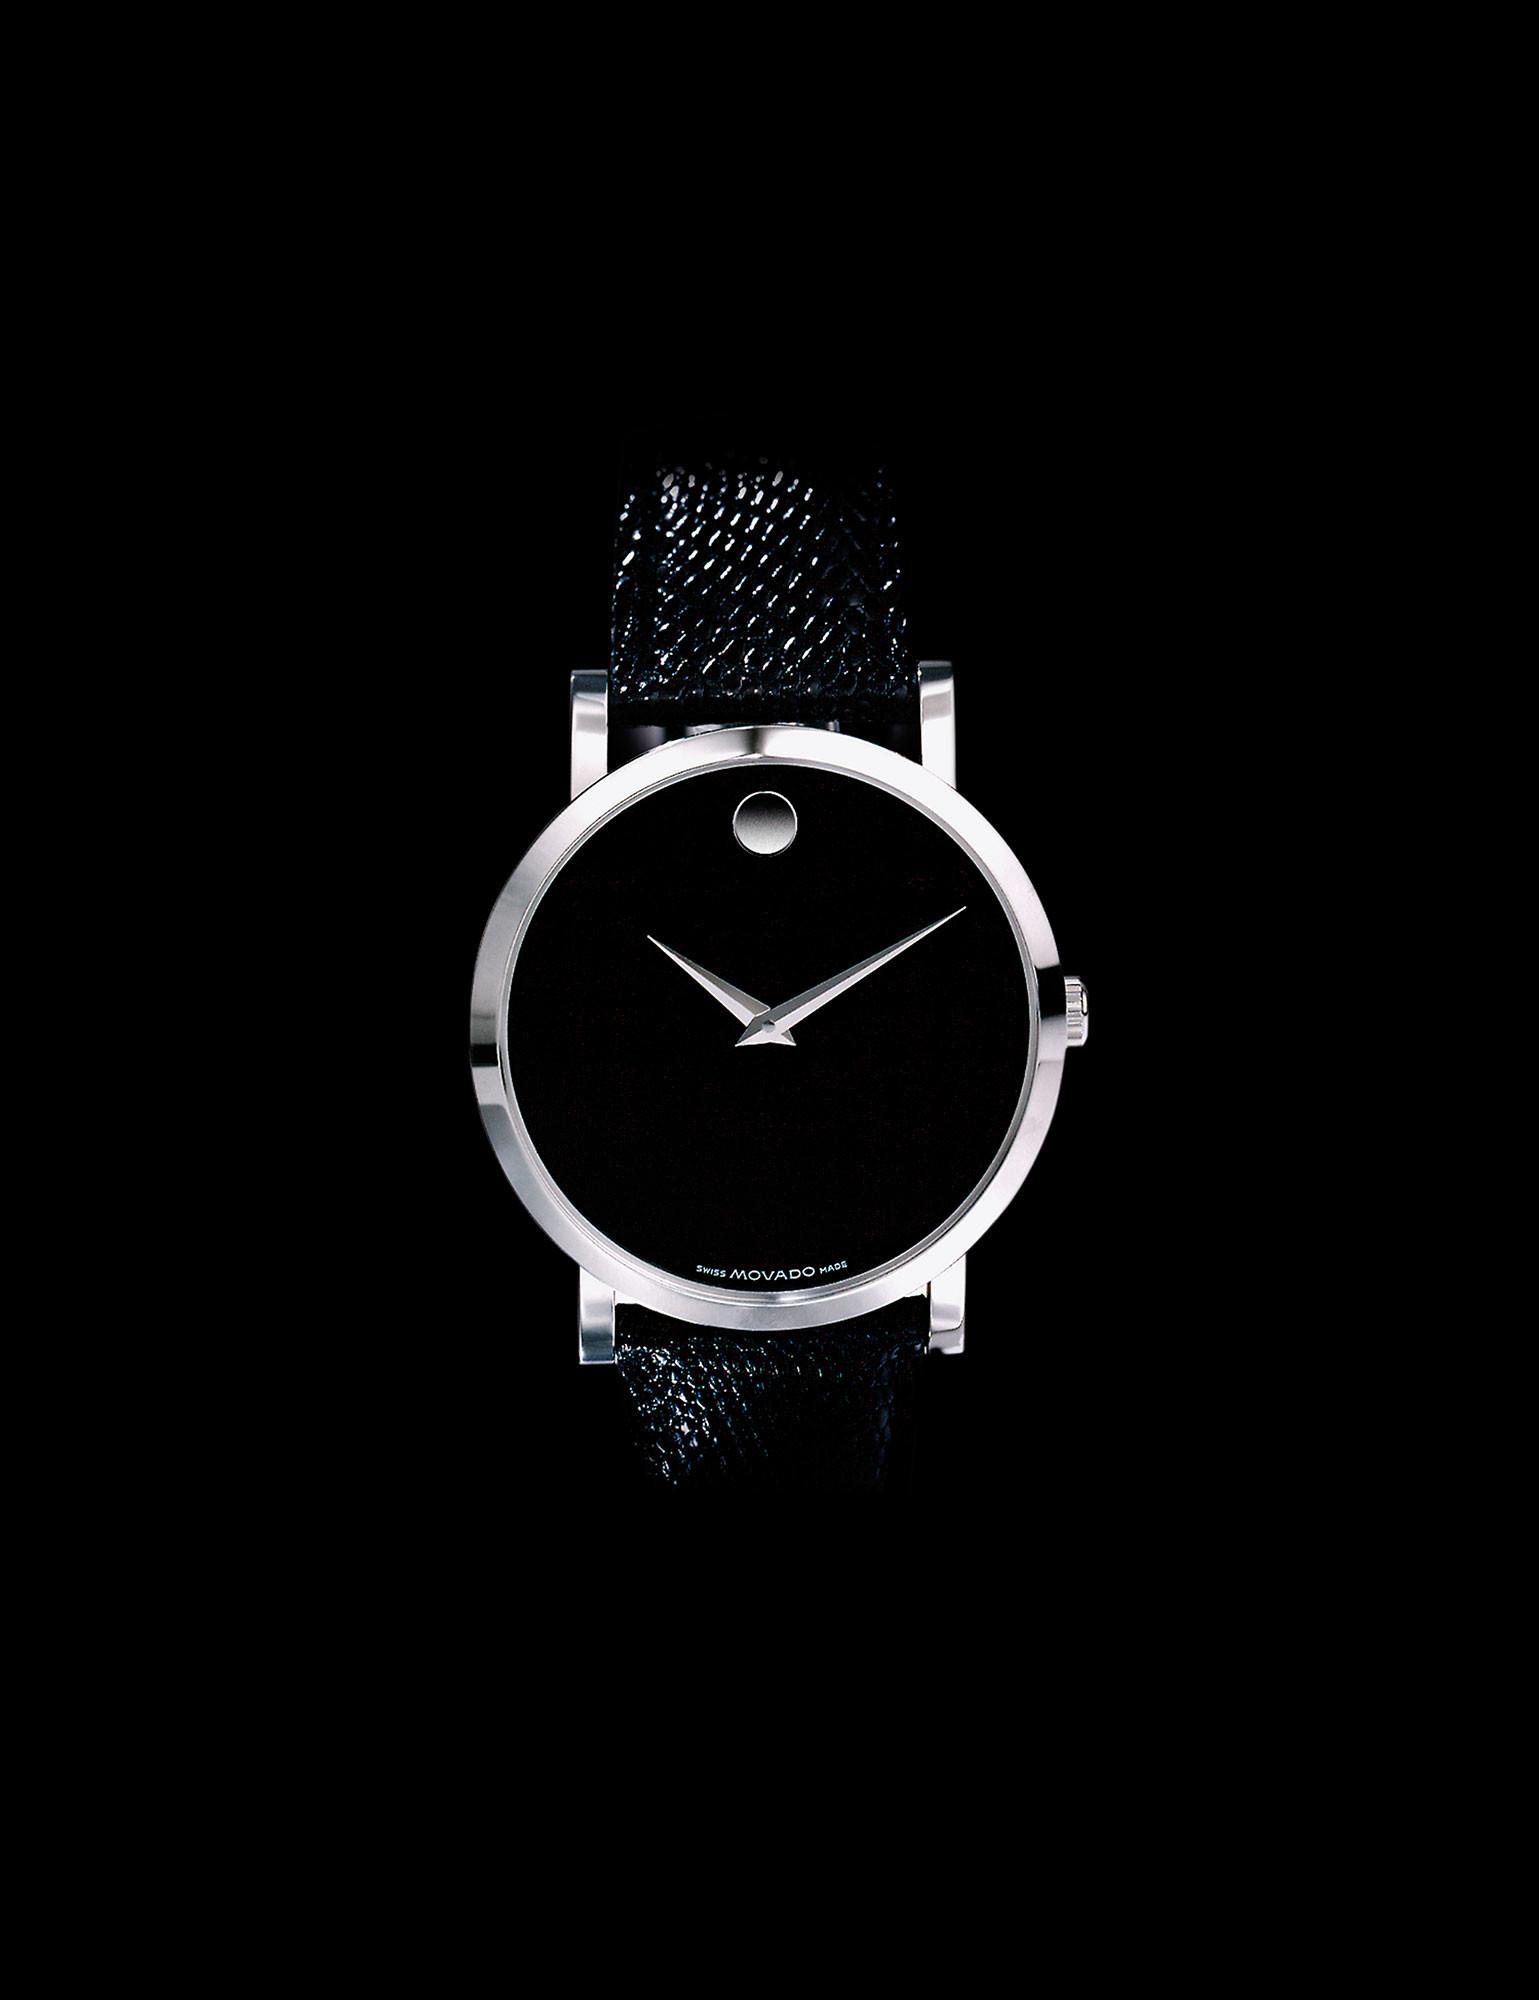 Movado-Black-Watch-1539x2000.jpg